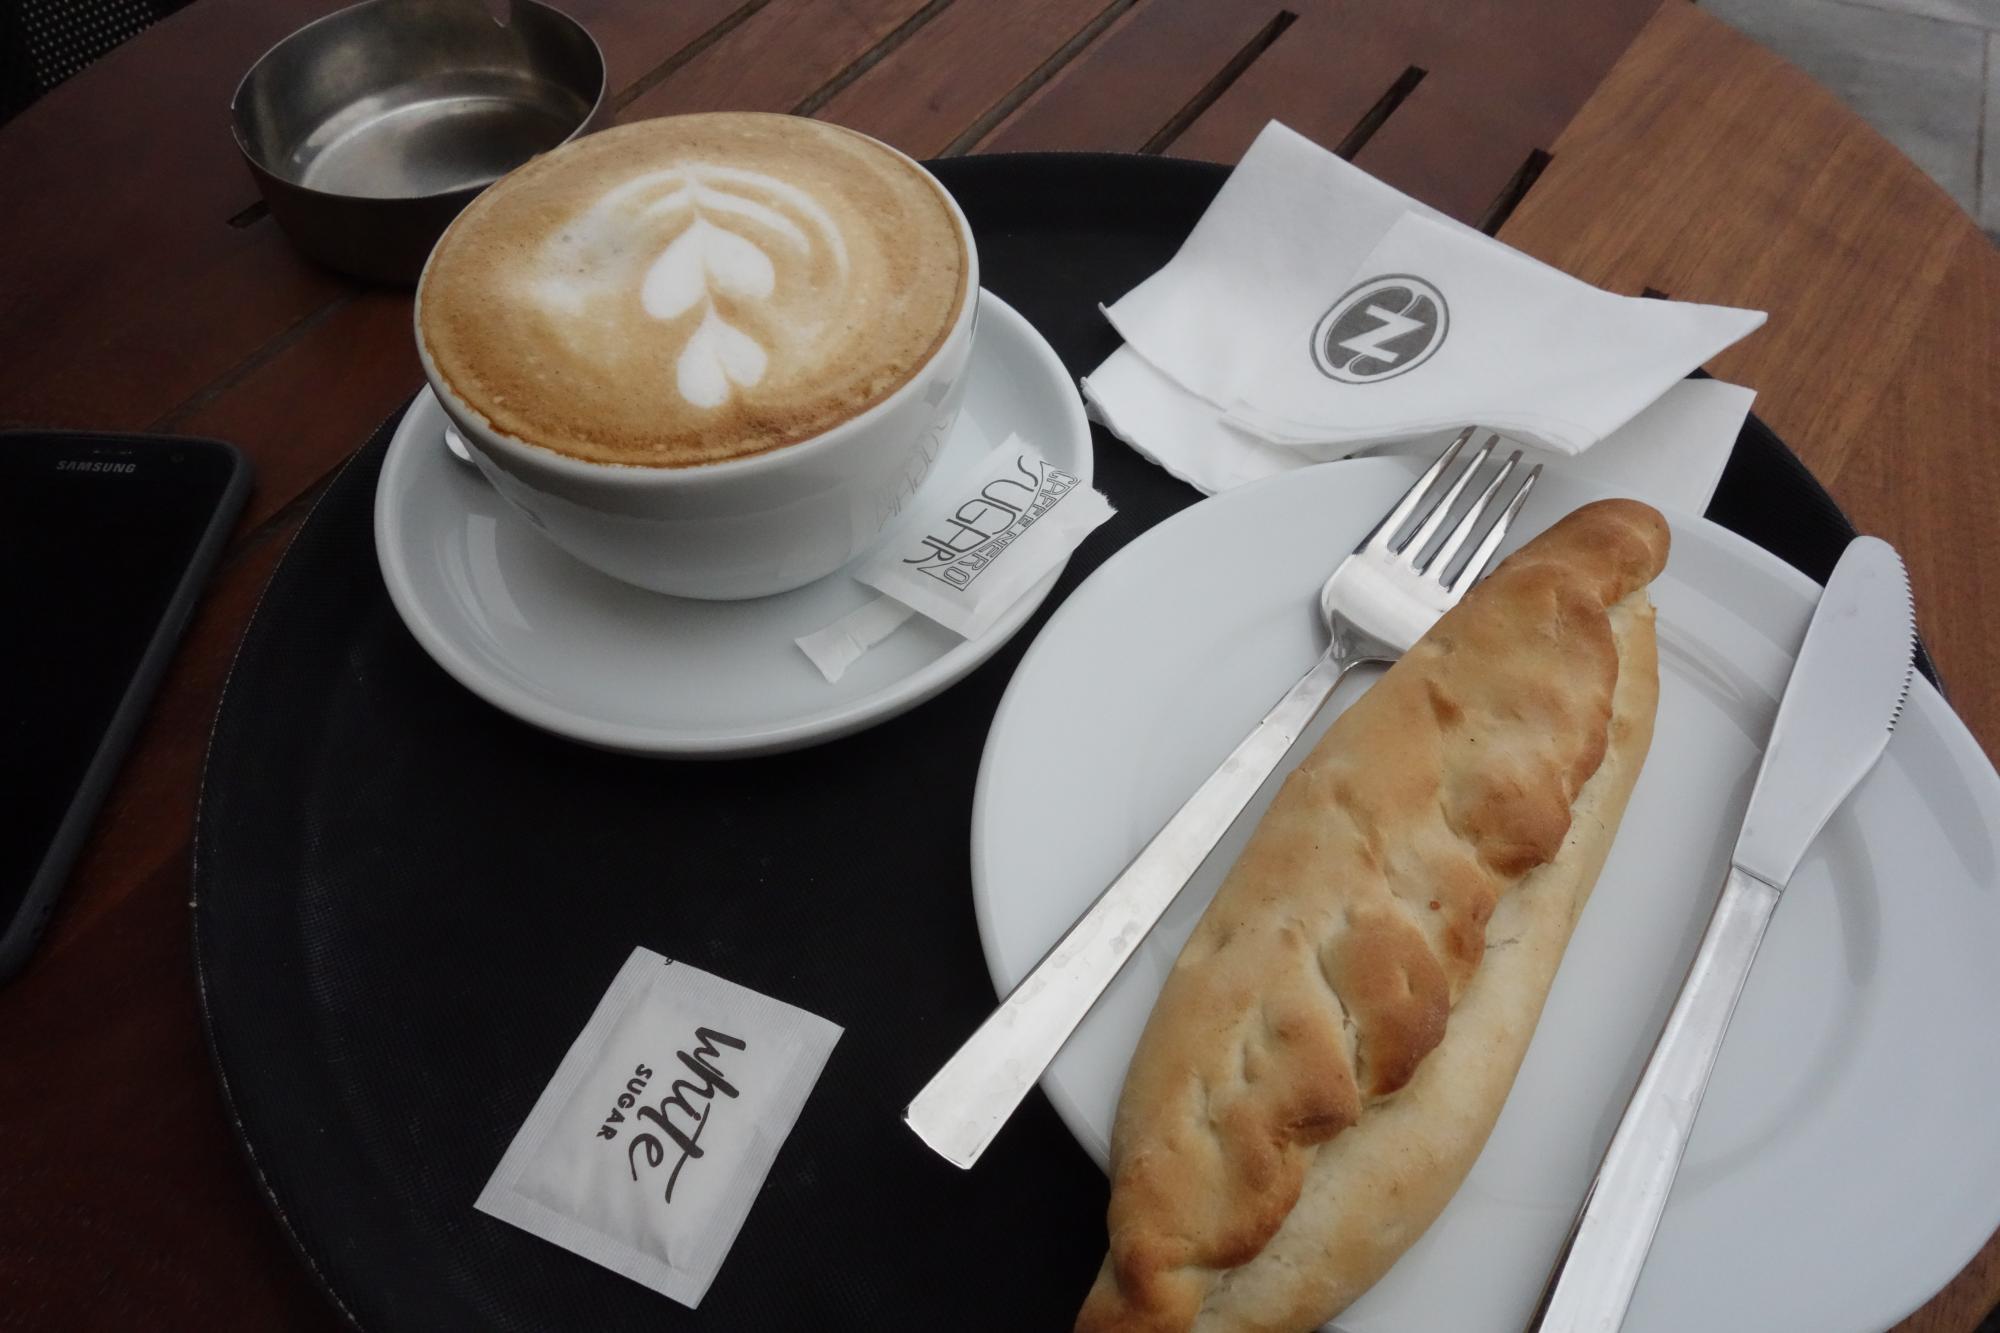 halloumi_pie_es_cafe_latte_az_ebed.JPG